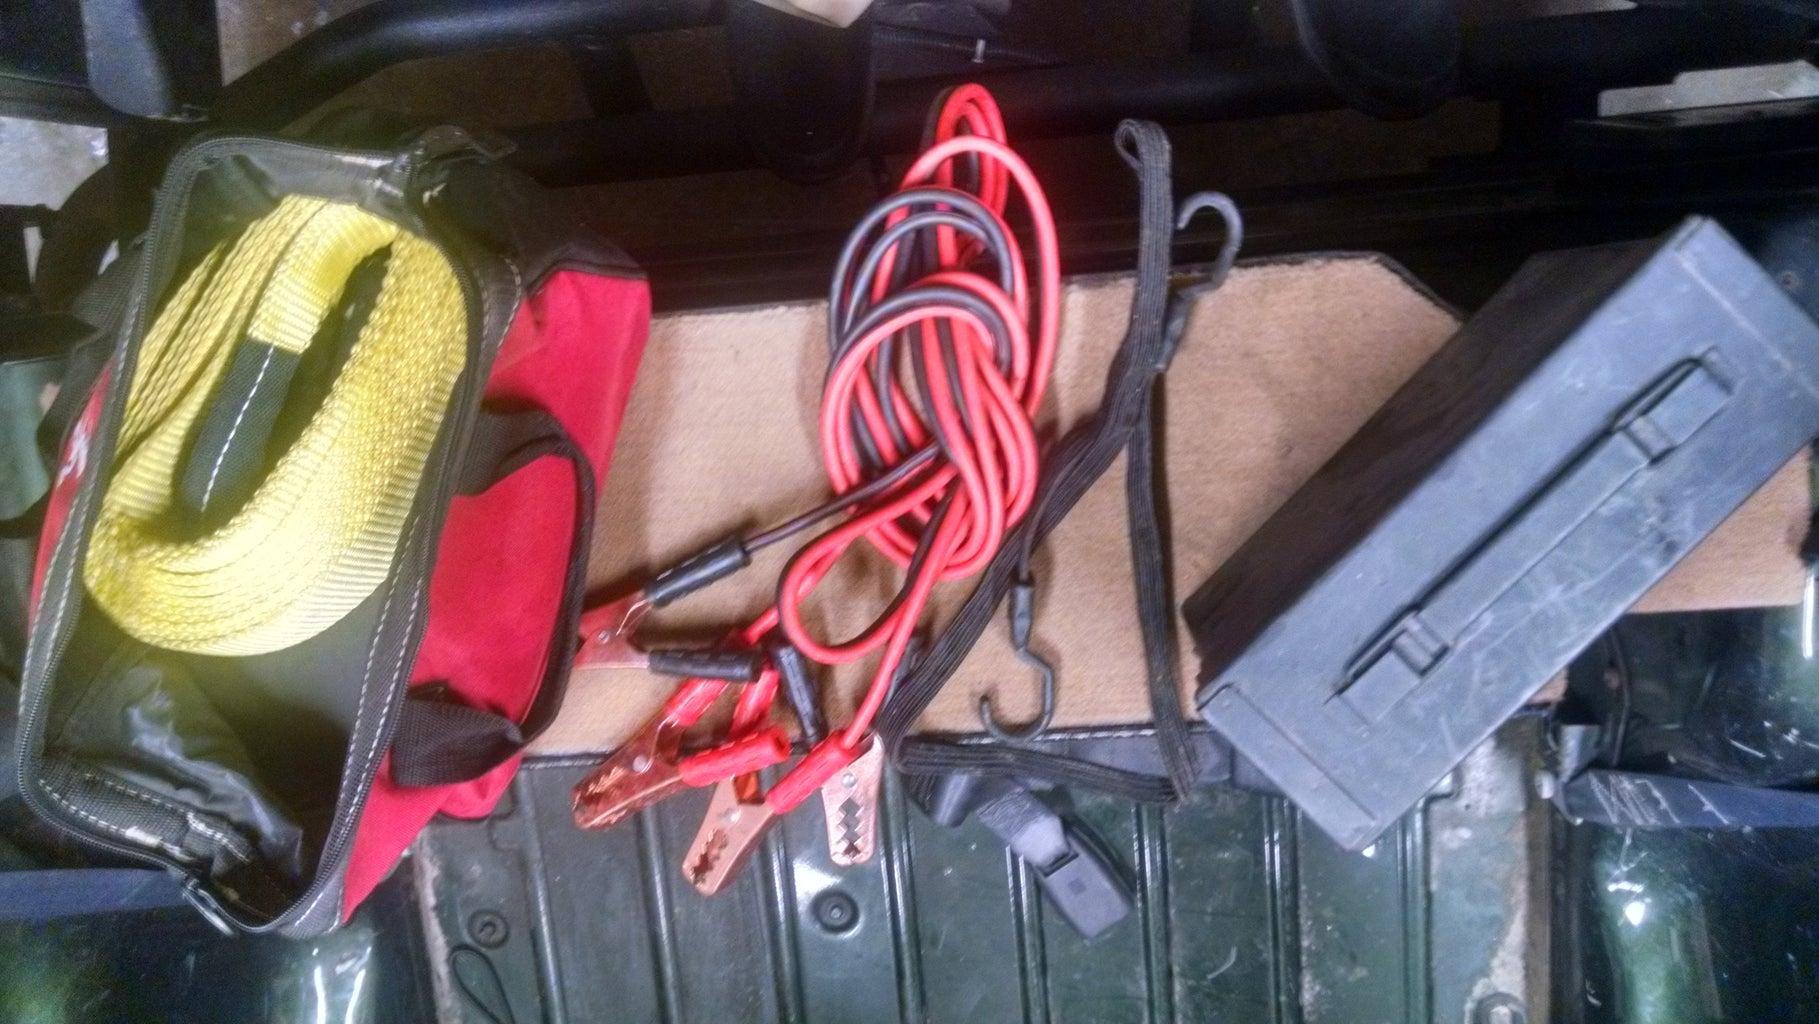 Car: Roadside Kit